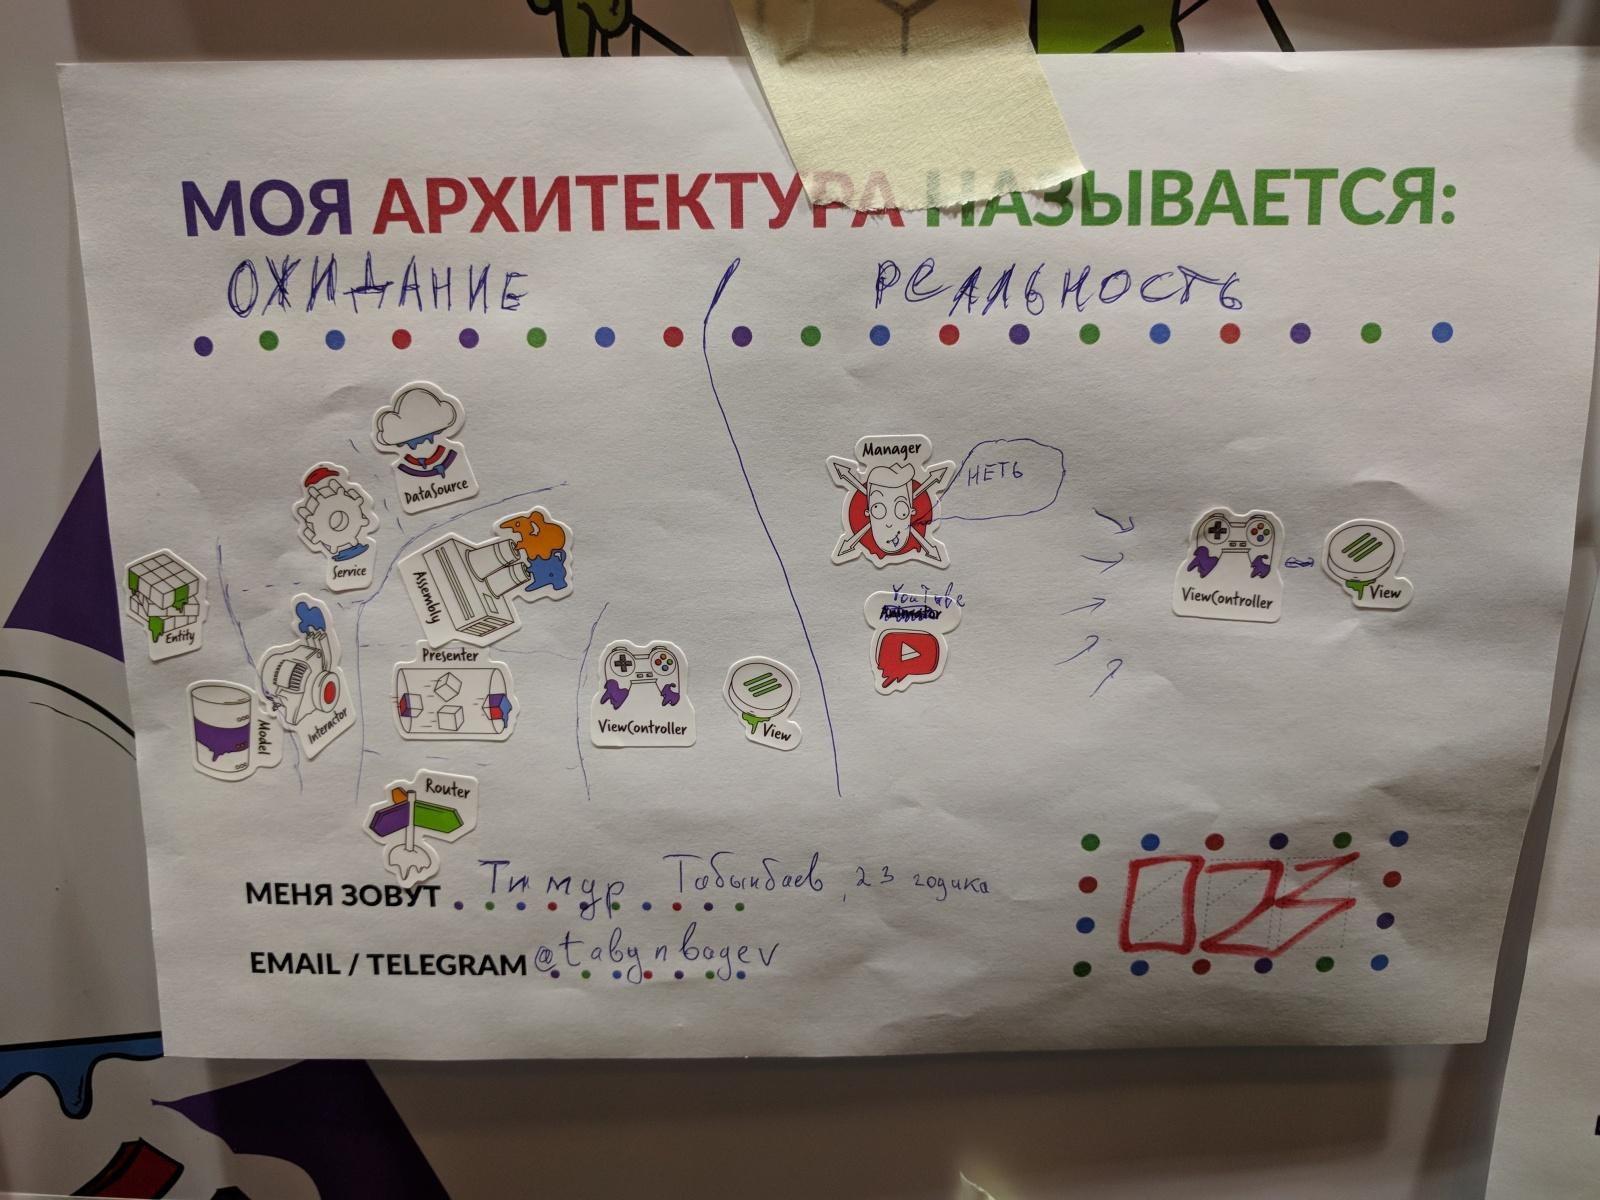 От Kotlin до плётки: как прошёл Mobius 2017 Moscow - 3